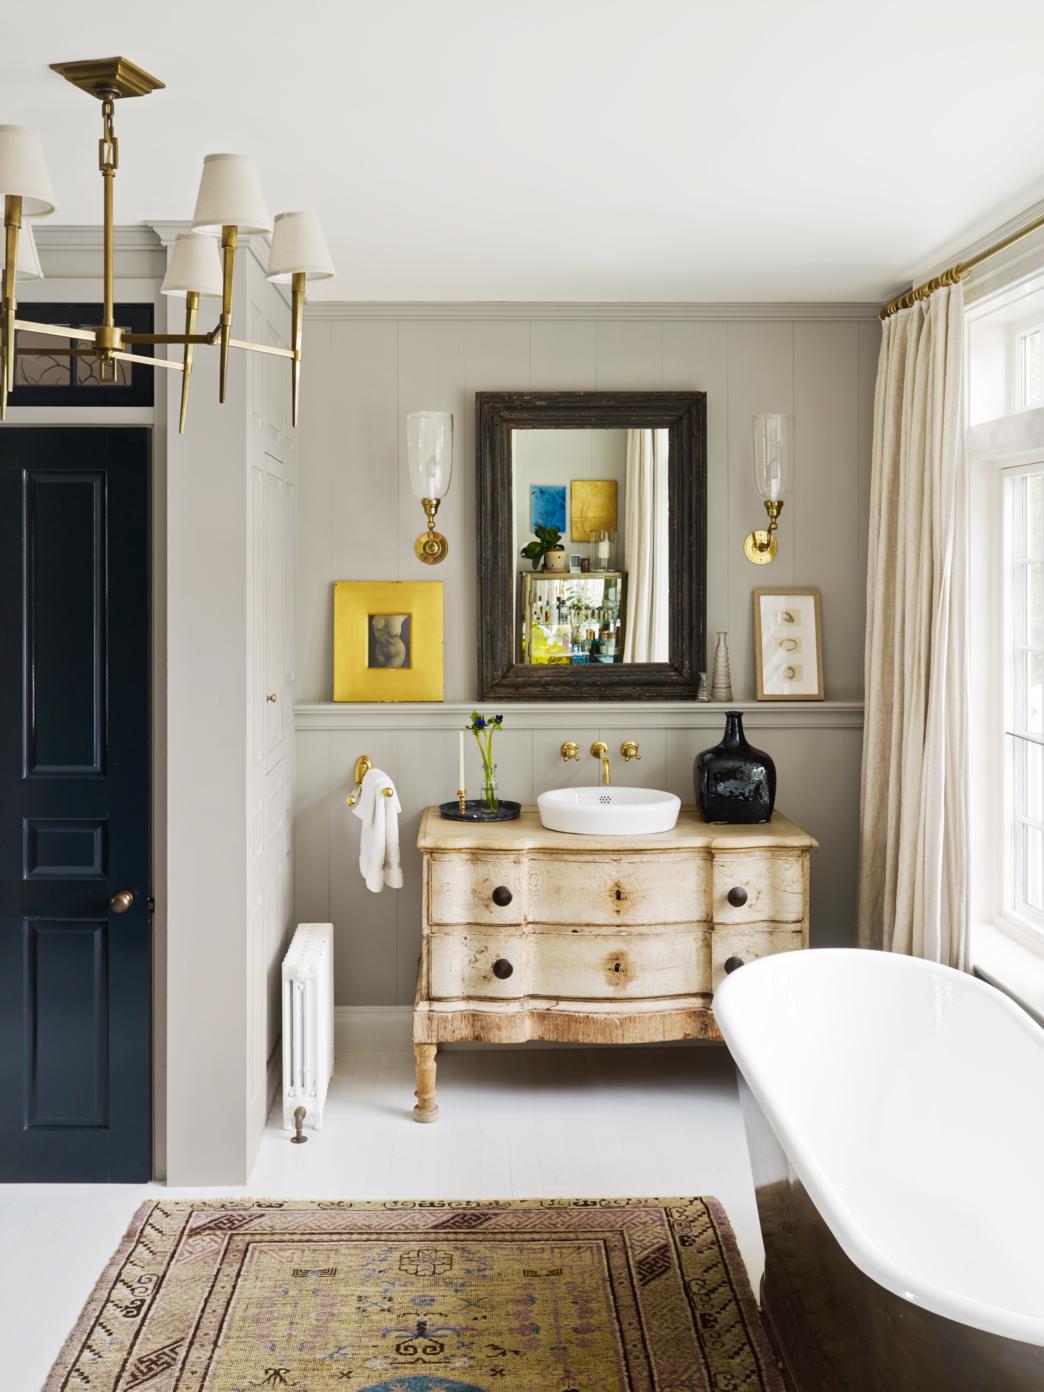 30 Best Bathroom Paint Colors 2020 Bathroom Paint Ideas,700 Square Foot Tiny House